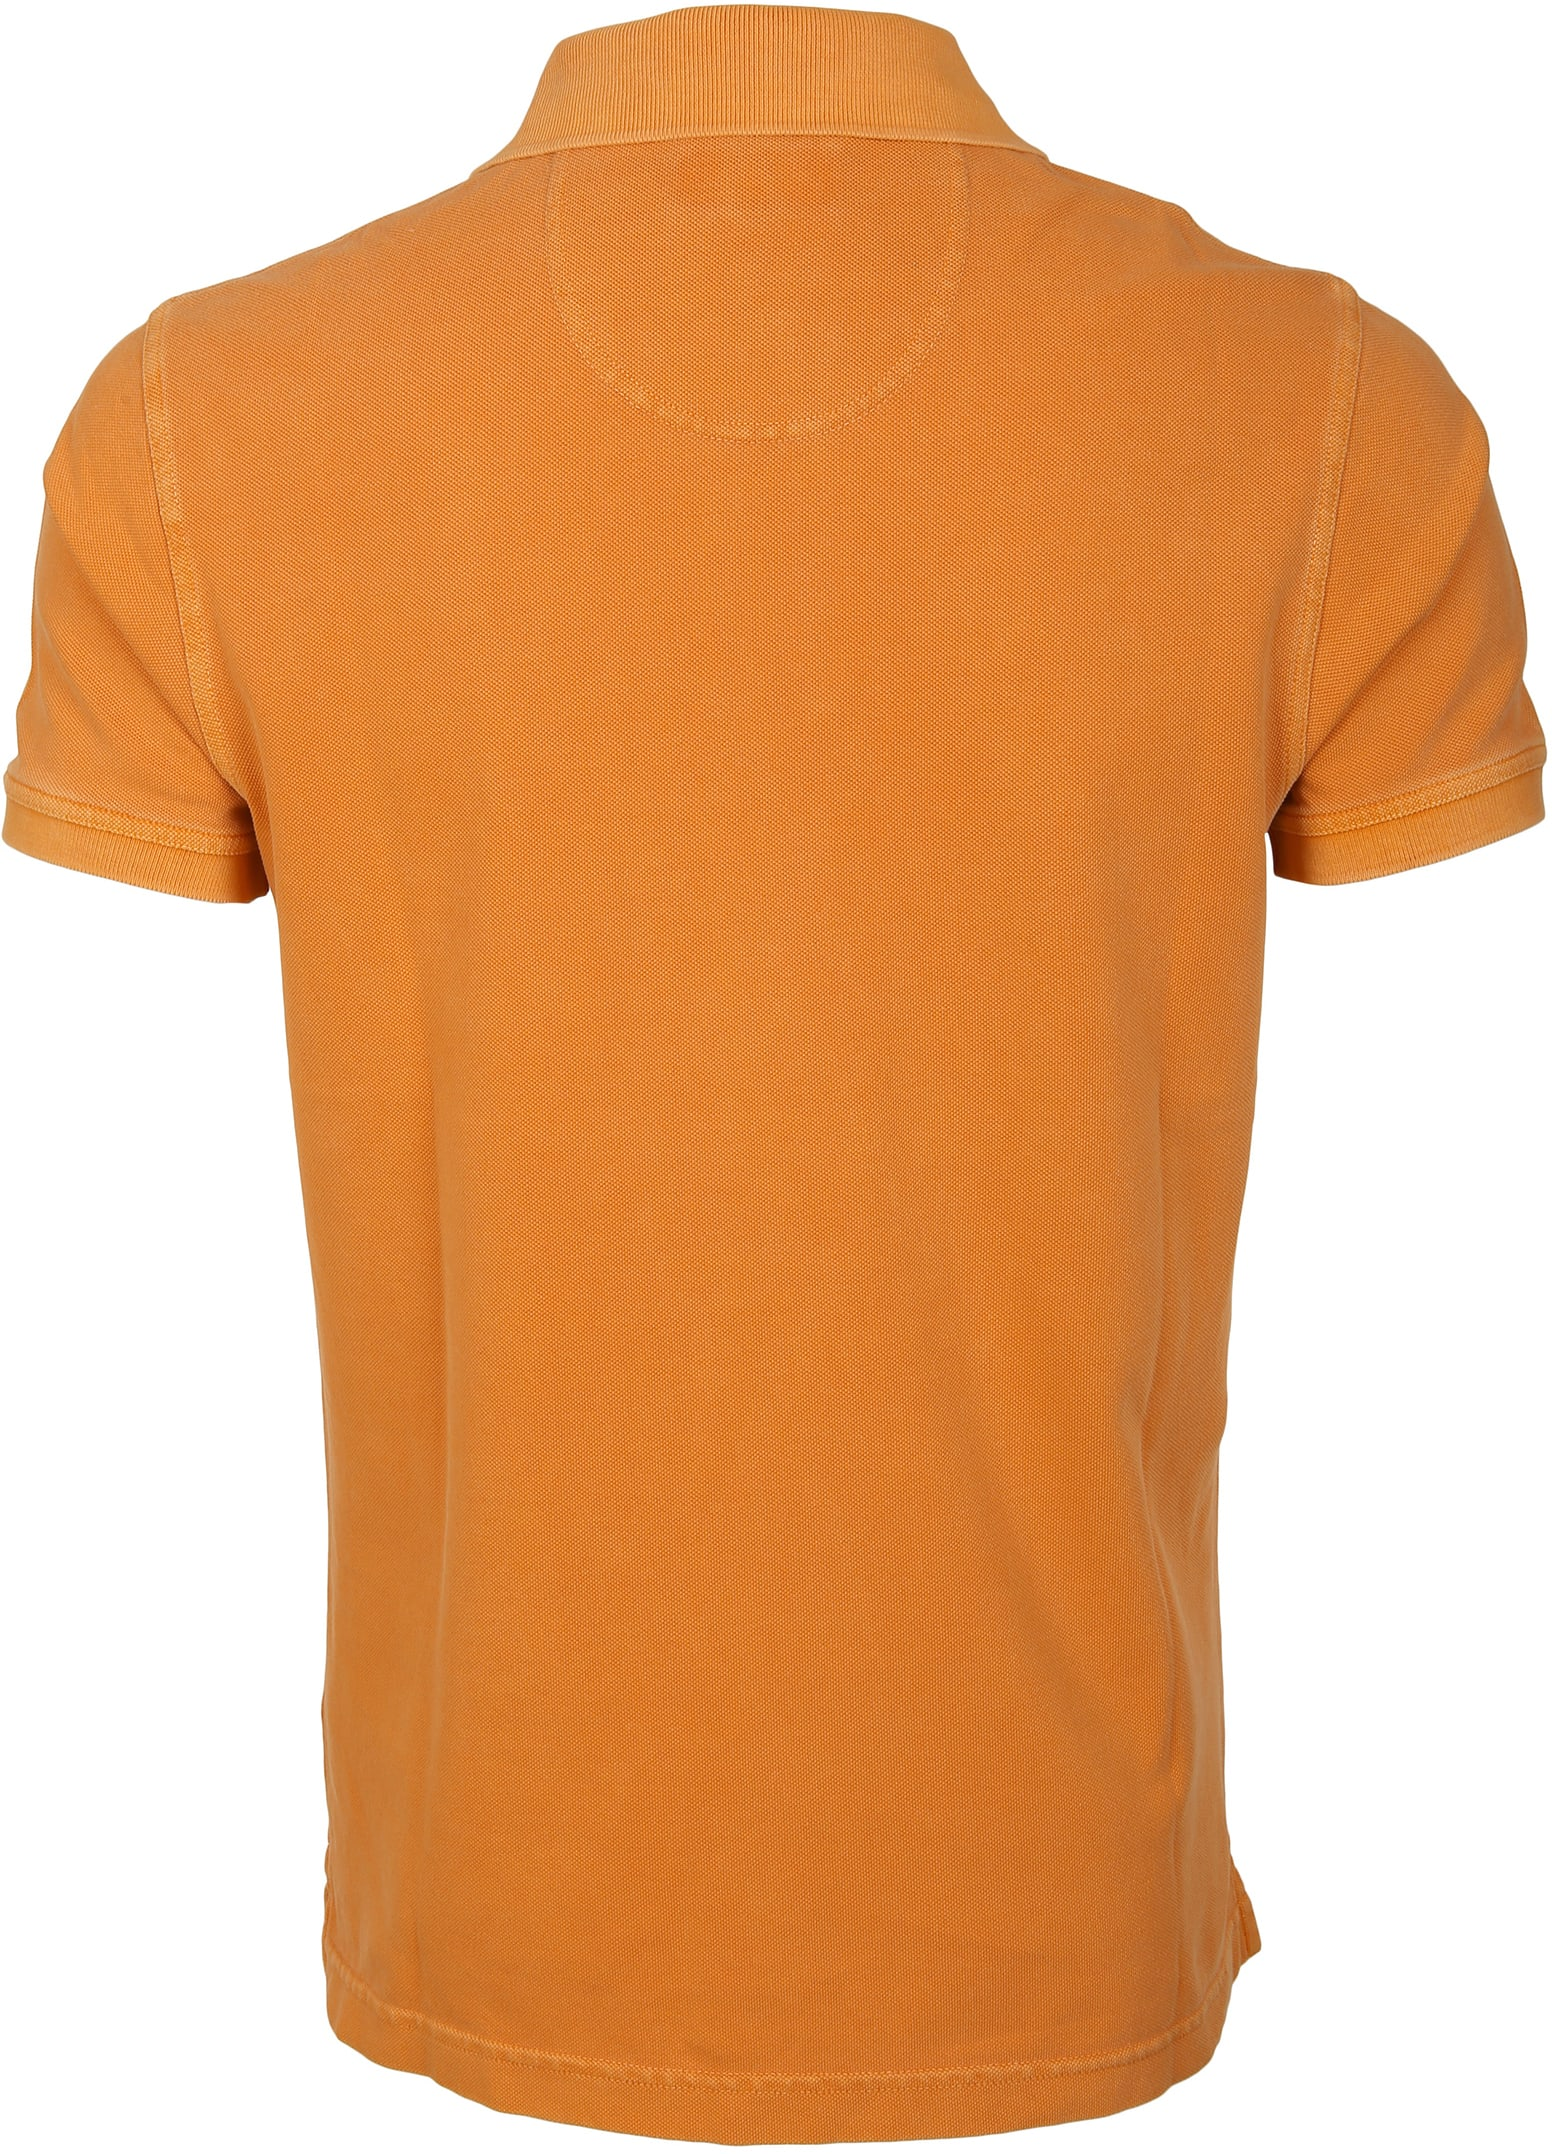 Barbour Poloshirt Orange Wash foto 2